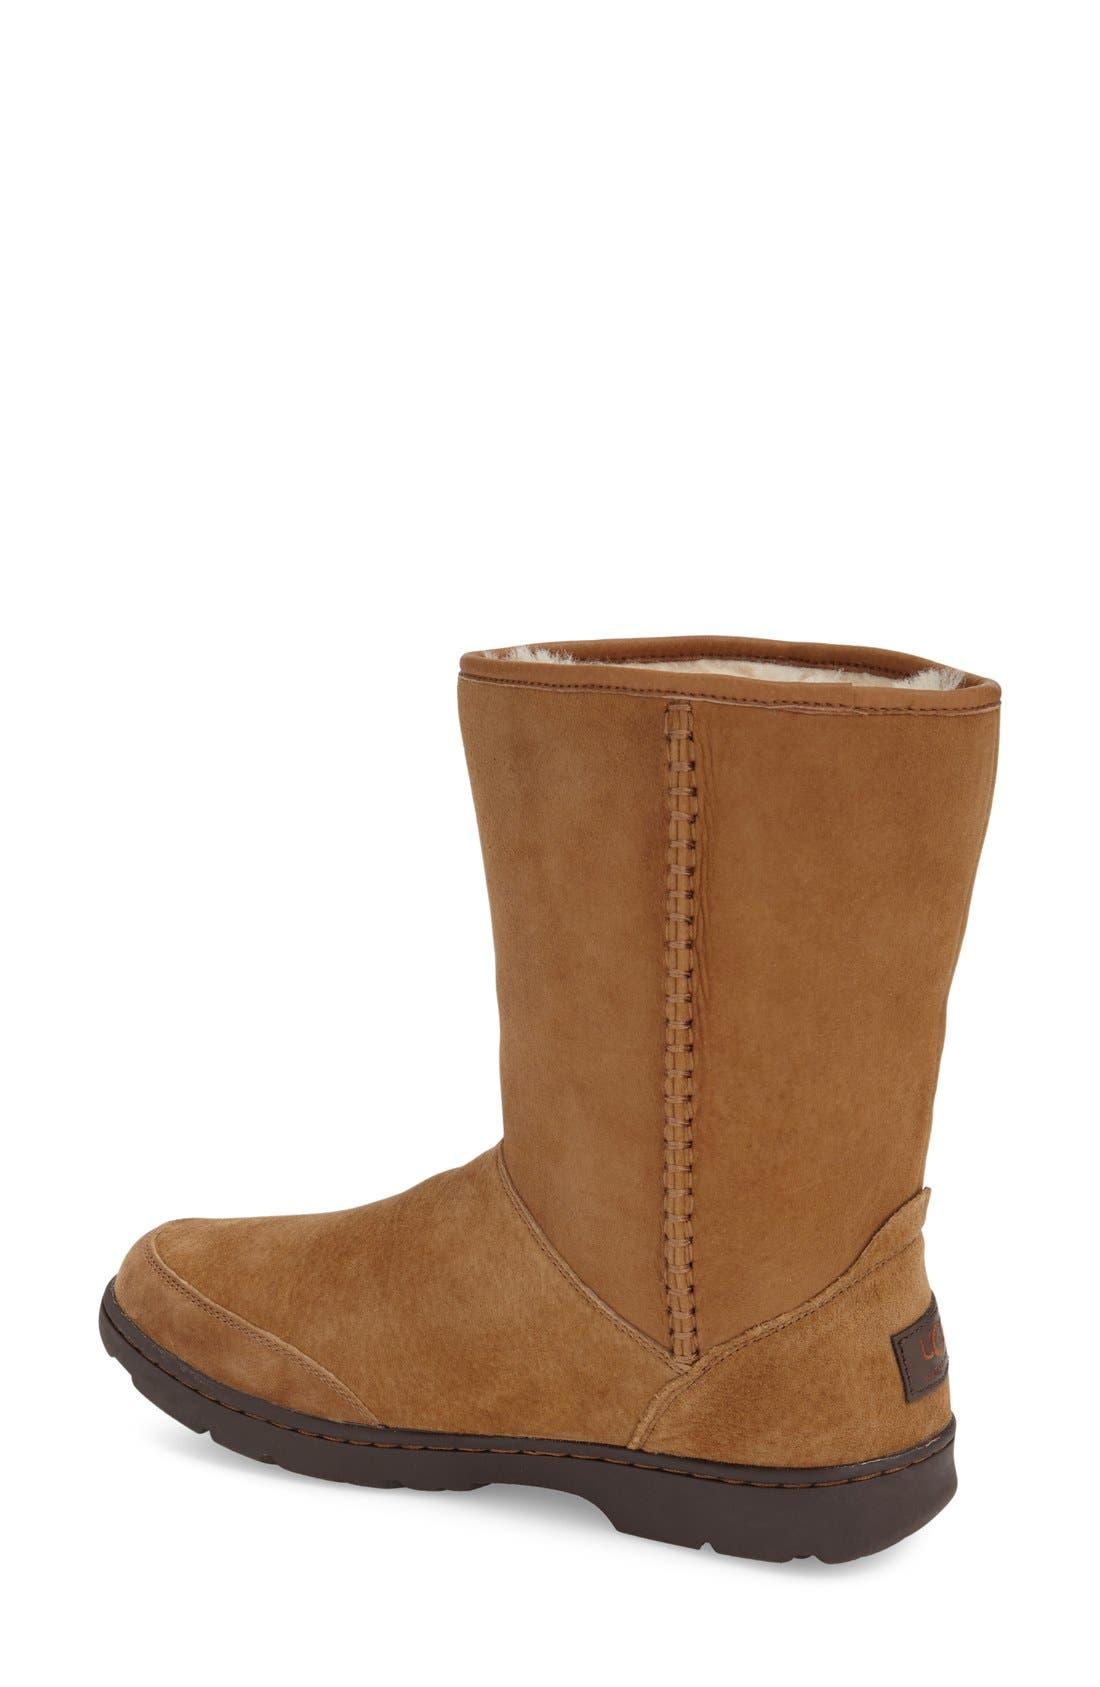 Alternate Image 2  - UGG®Michaela Waterproof Suede Boot (Women)